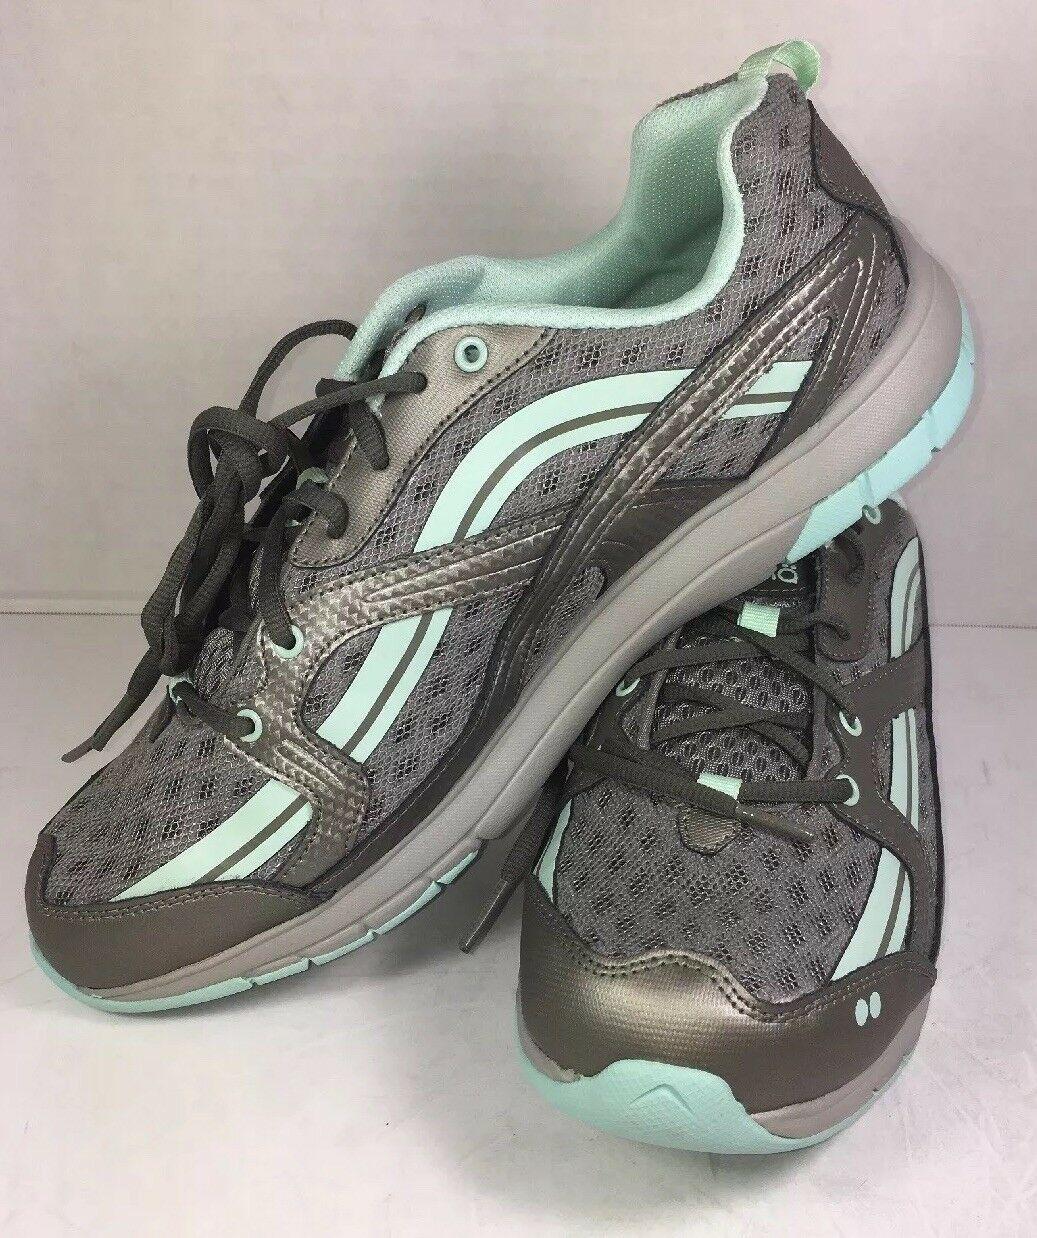 RYKA SMT STANCE Womens Grey/Mint  Cross Trainer Shoe Size US 11 M/ UK 9/ EU 43